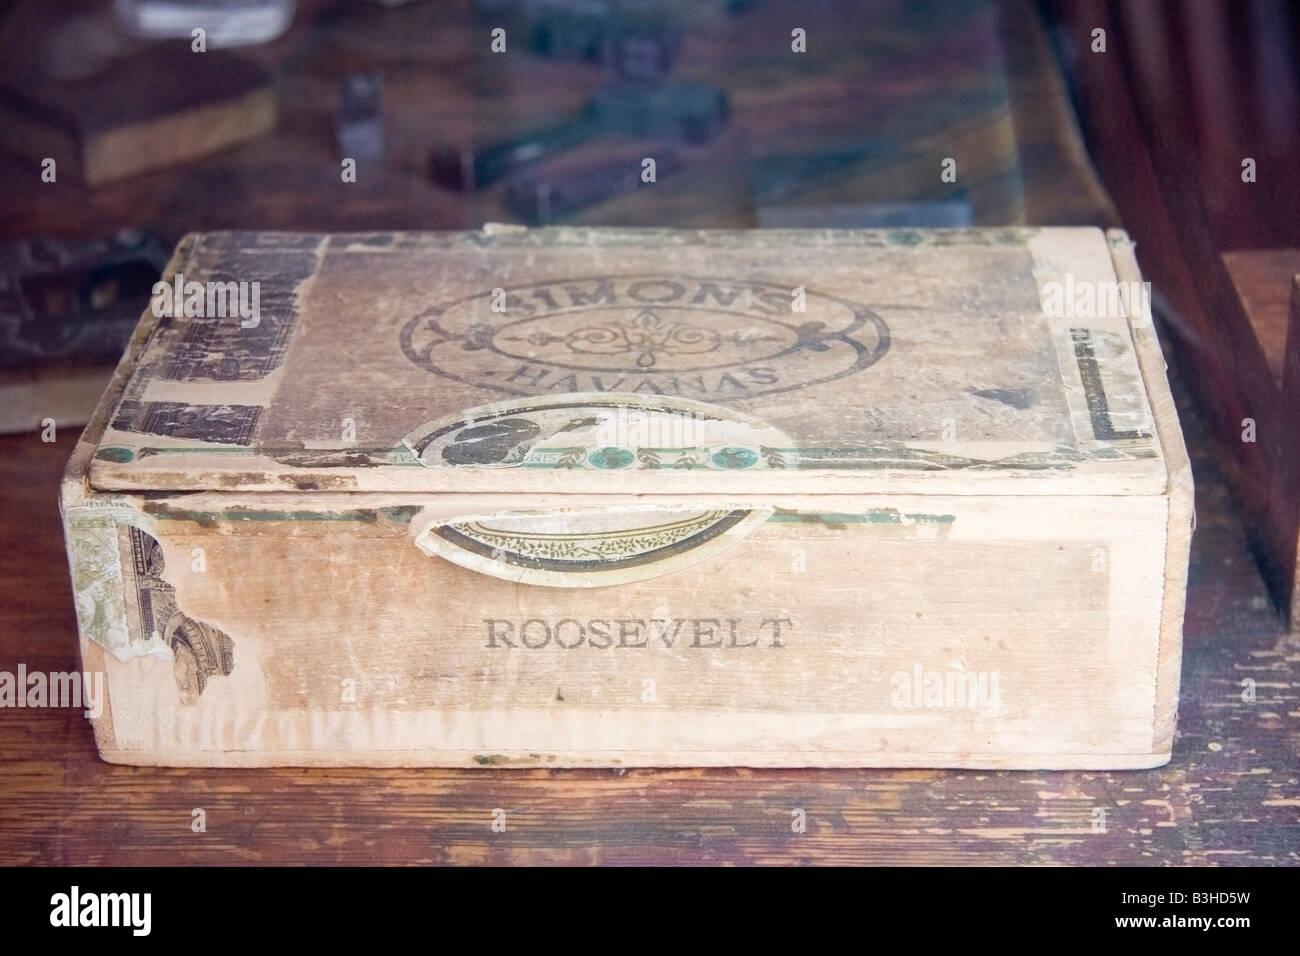 vintage cigar box with broken customs seal - Stock Image